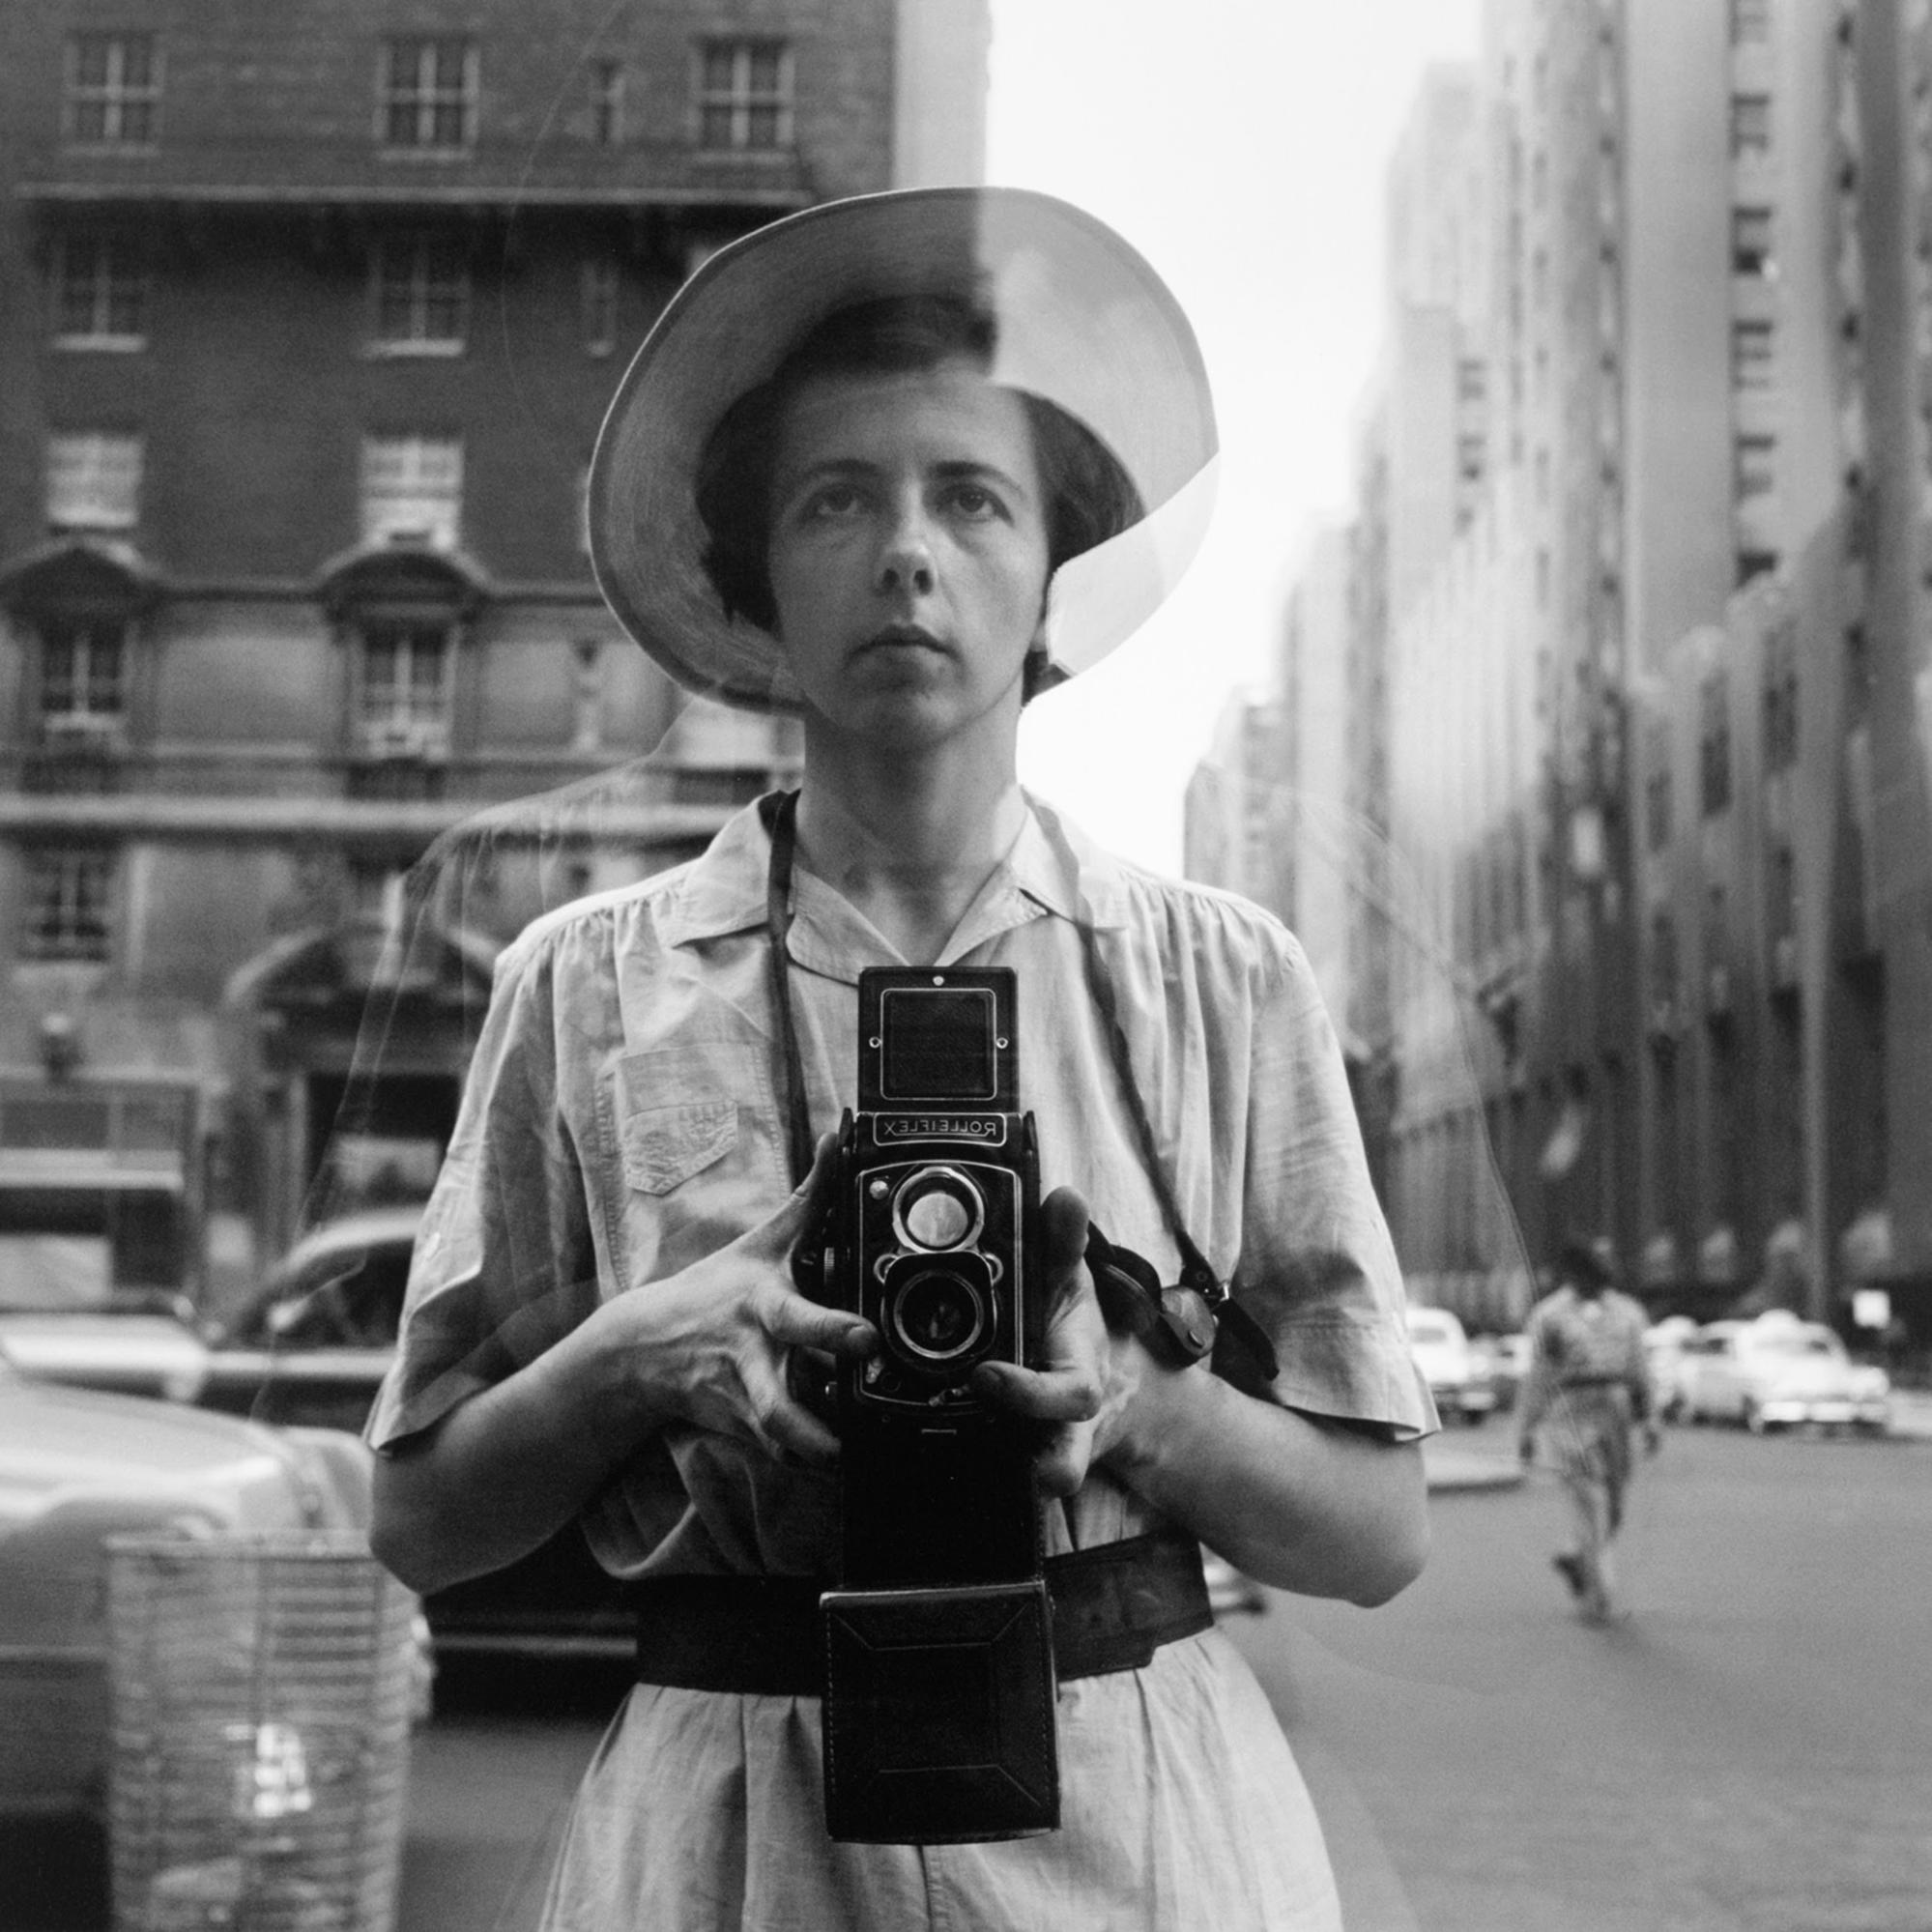 Autoritratto, New York, data sconosciuta © Vivian Maier